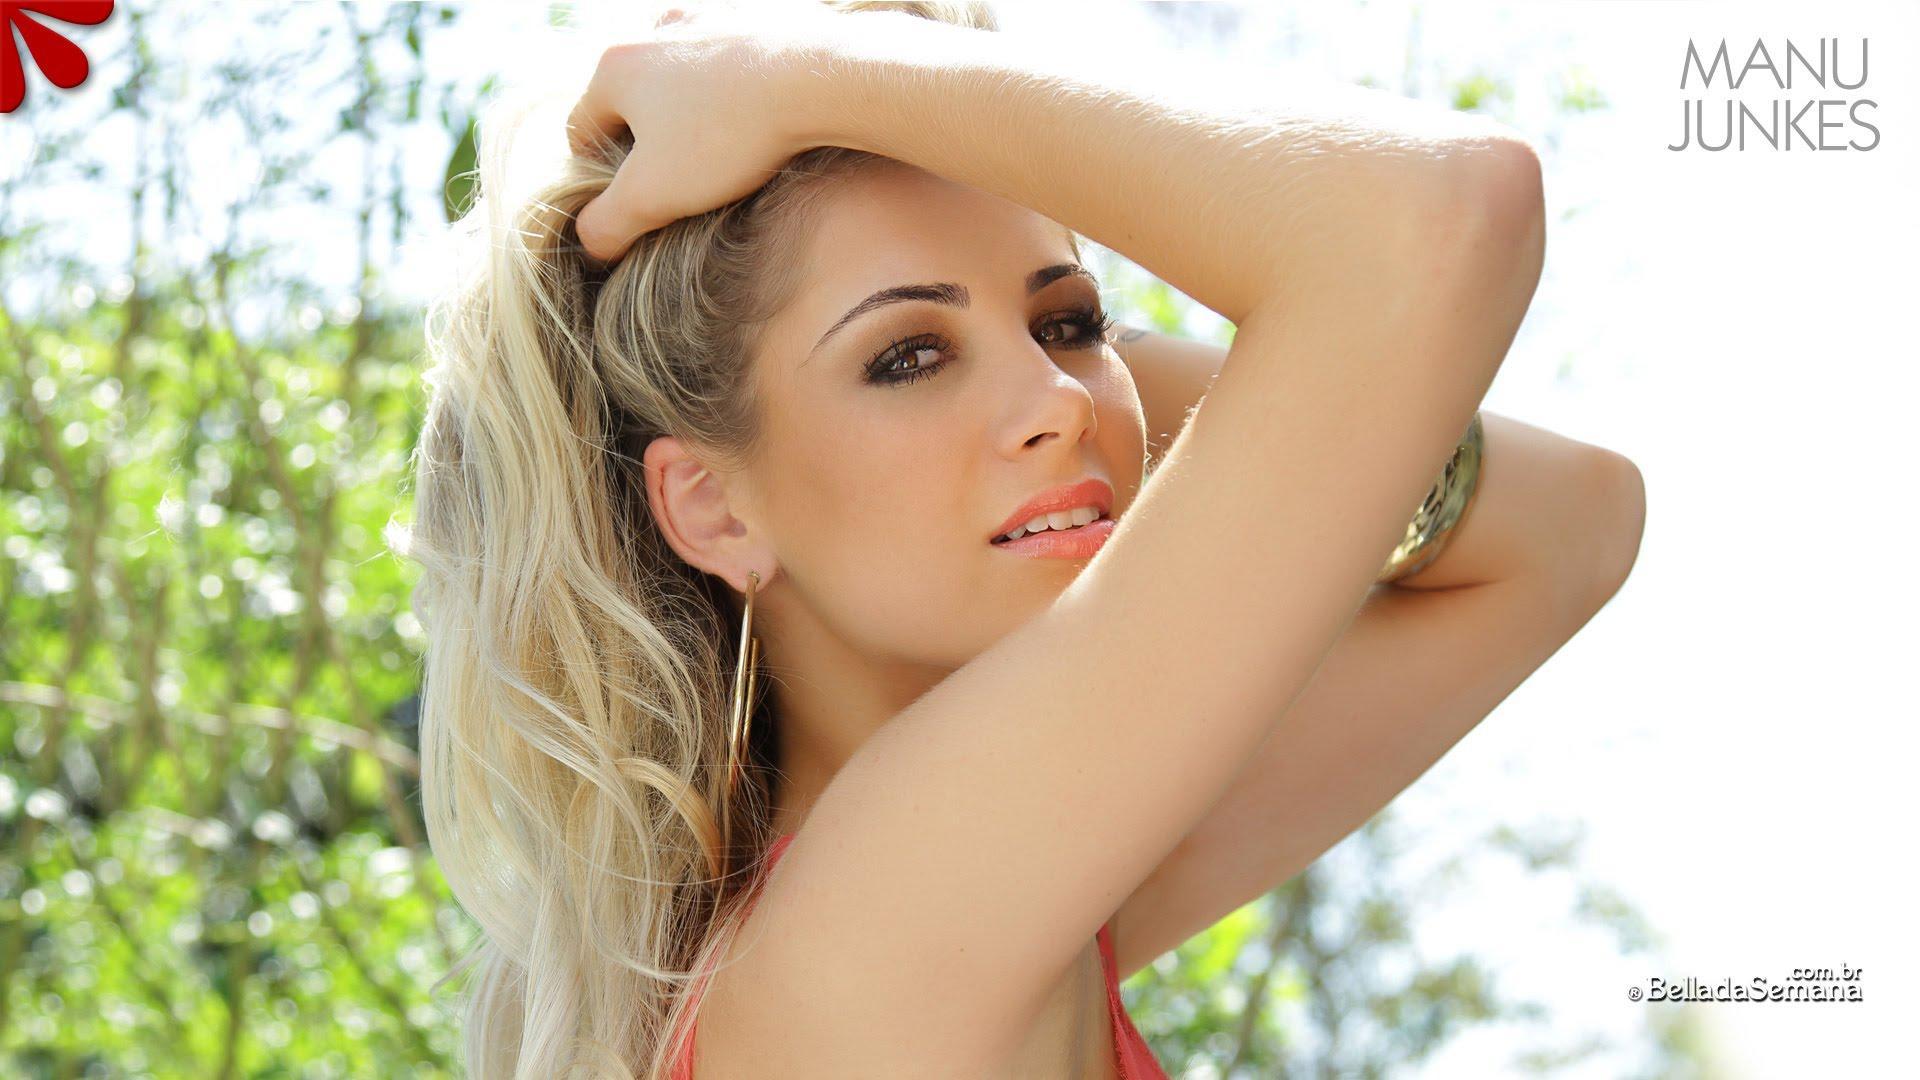 Manu Junkes   Part 2   Sexy Super Models   Bikini Babes   Hot Photo Shoot   Bella Club